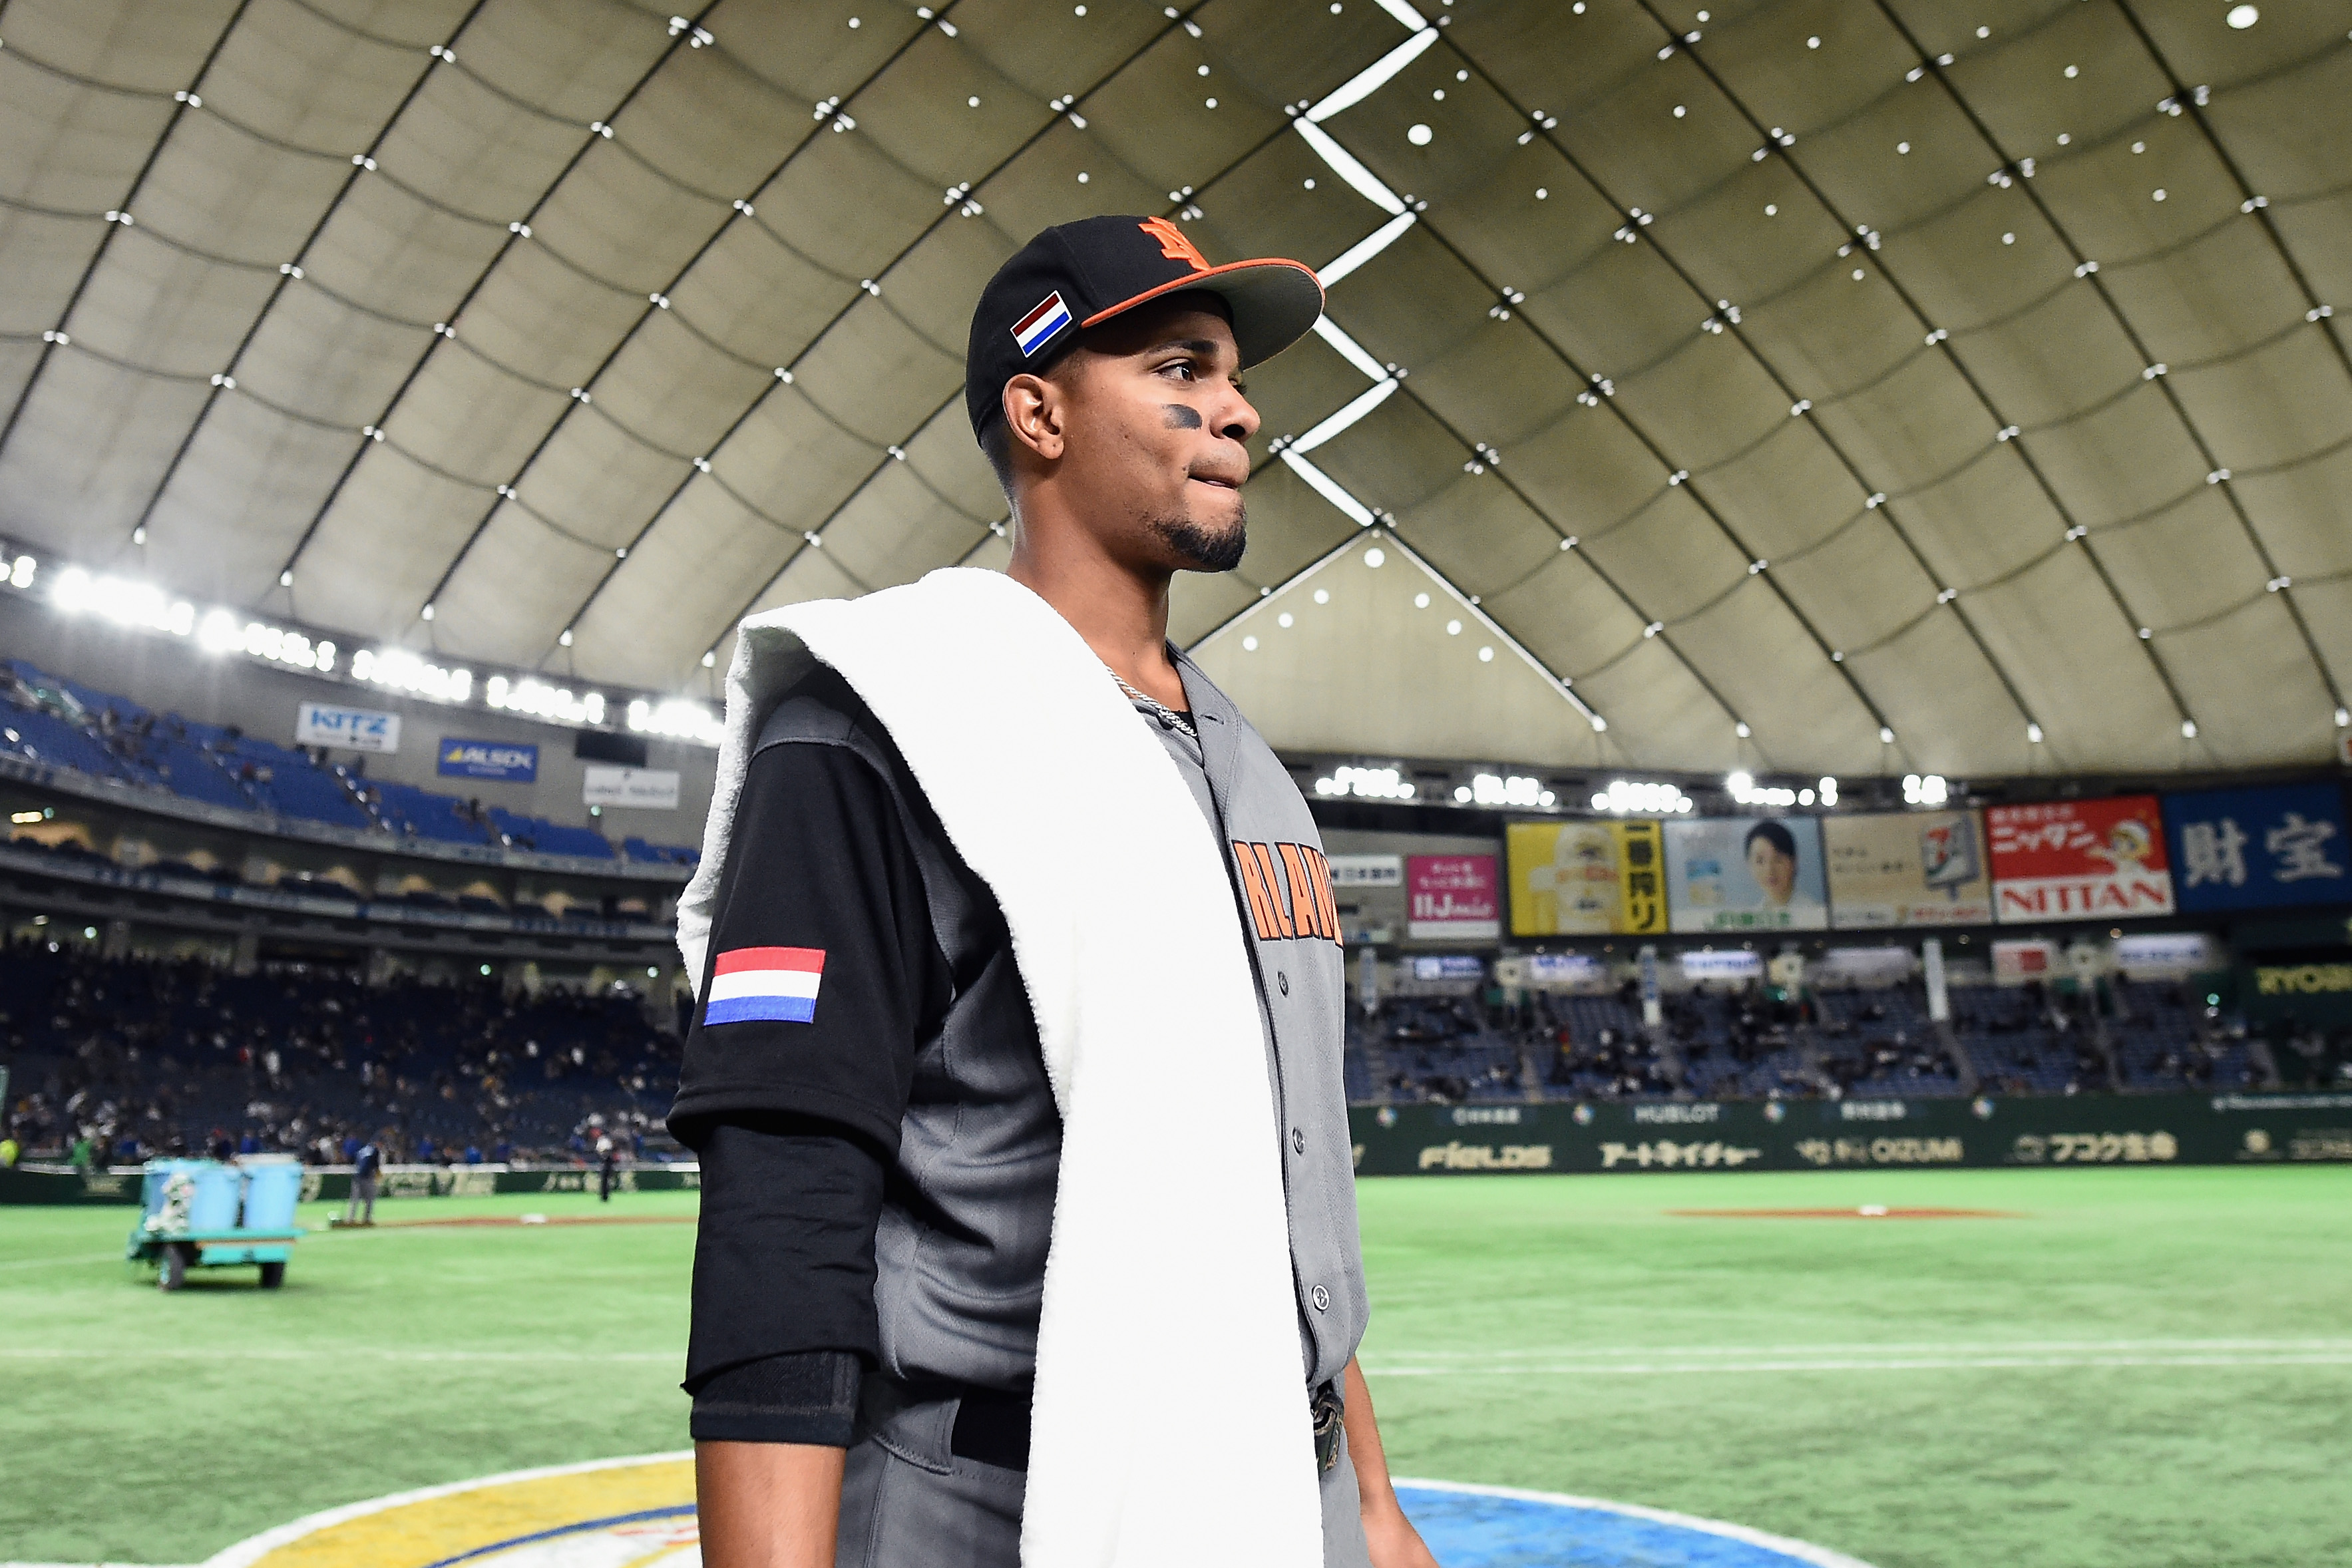 World Baseball Classic - Pool E - Game 5 - Netherlands v Cuba